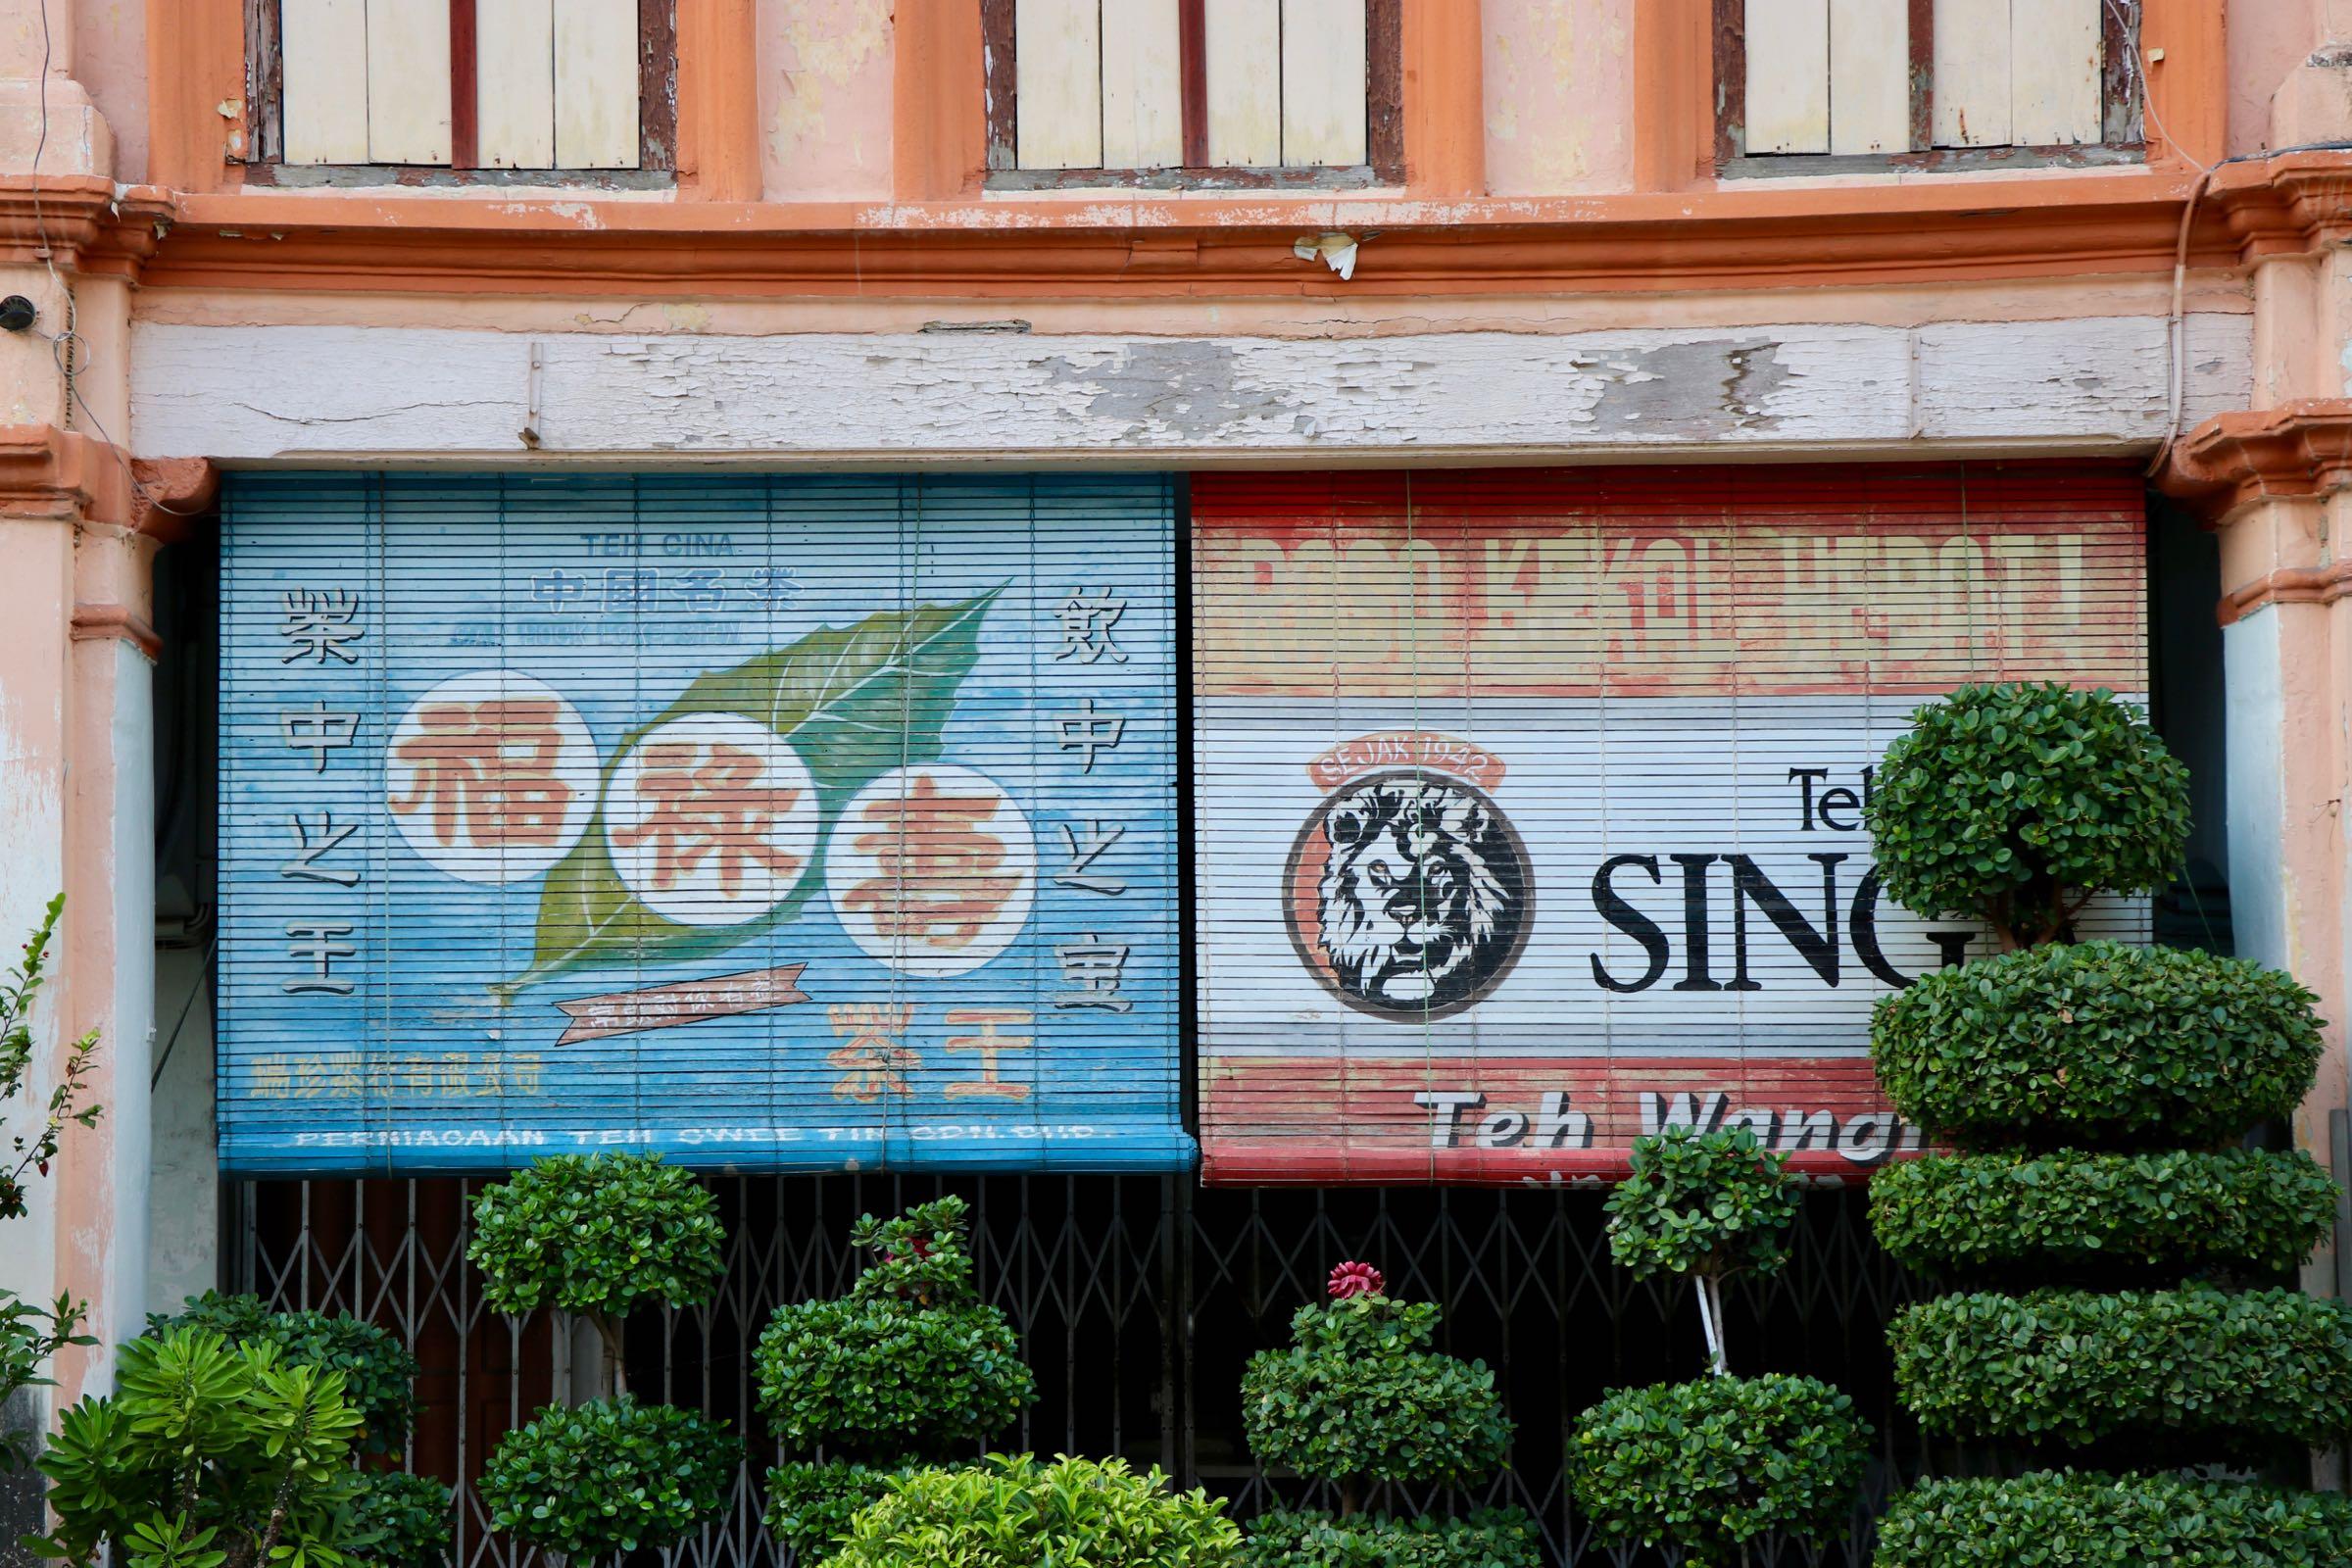 Hausfassade in Ipoh, Malaysia